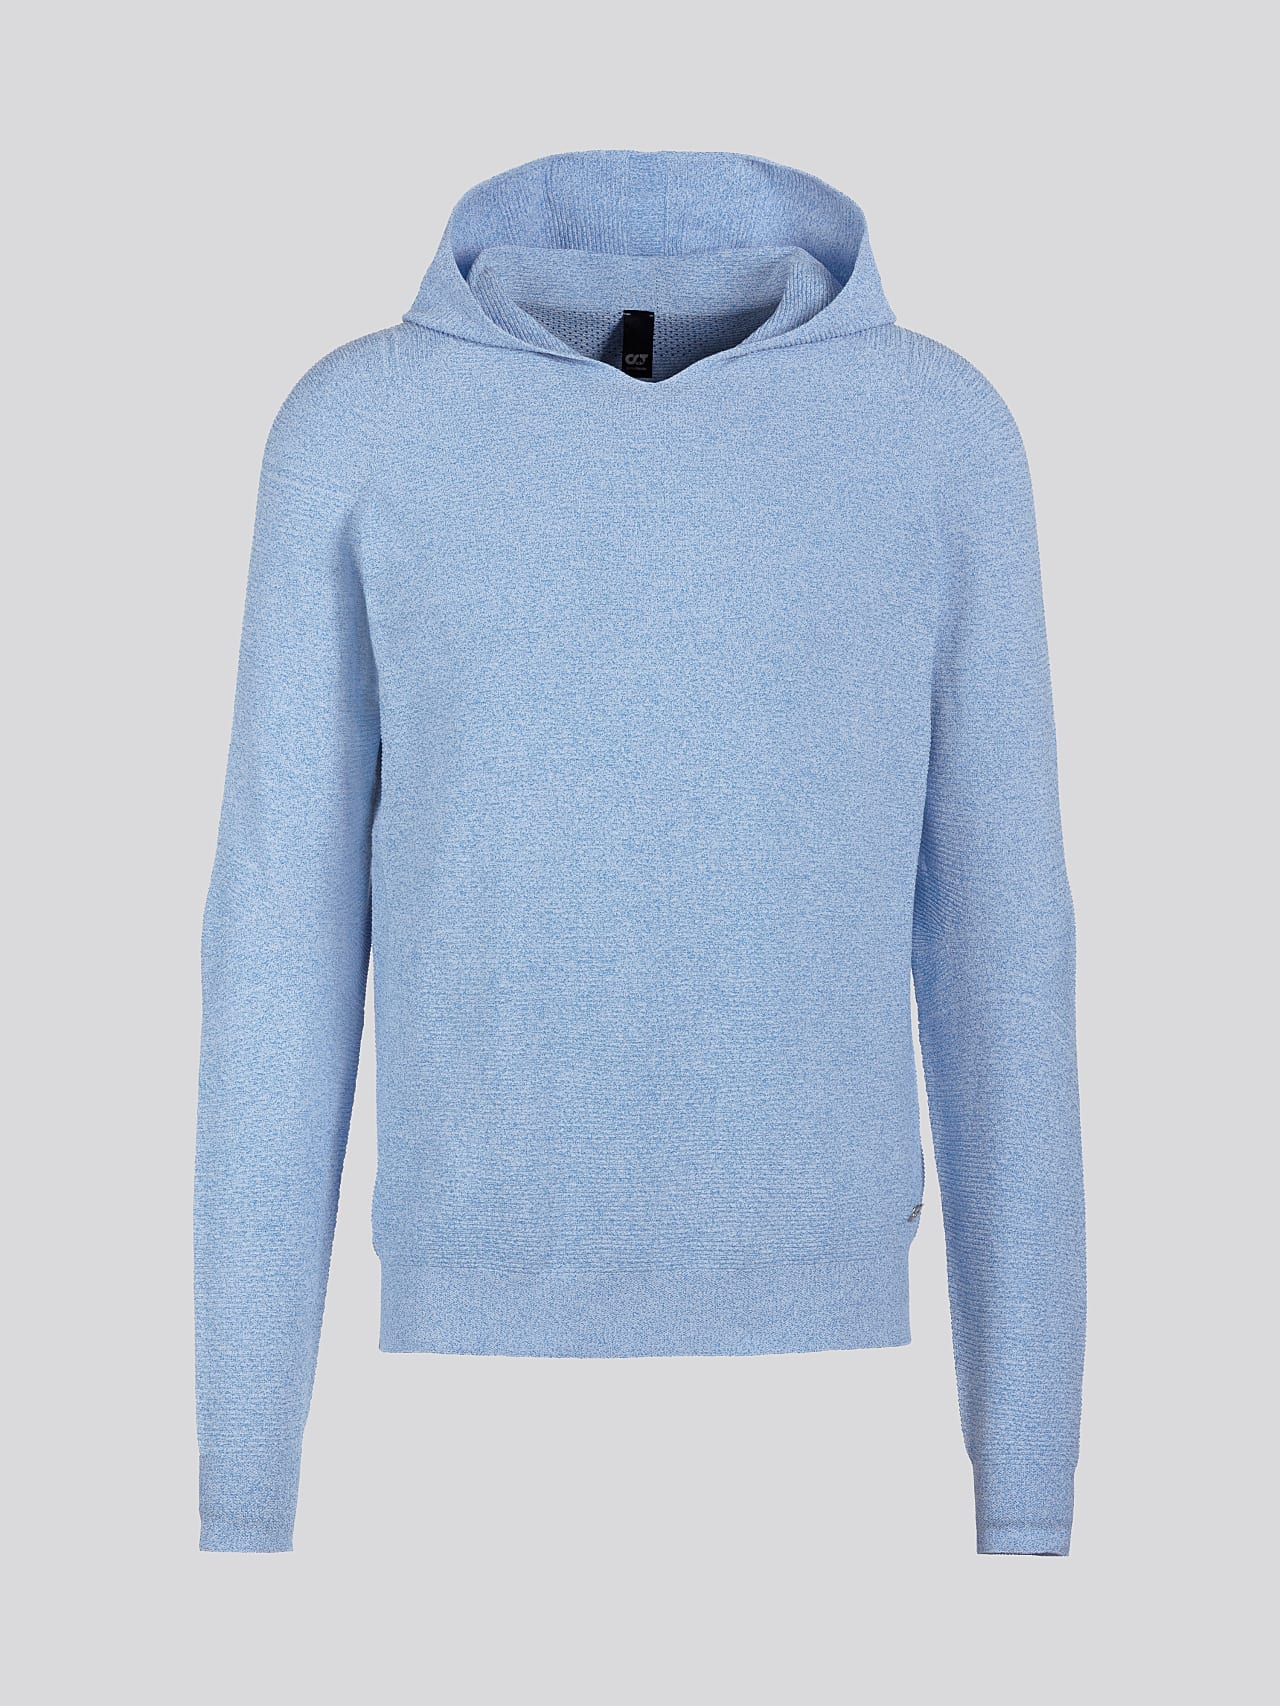 FURAP V3.Y5.01 Seamless Knit Hoodie blue / white Back Alpha Tauri